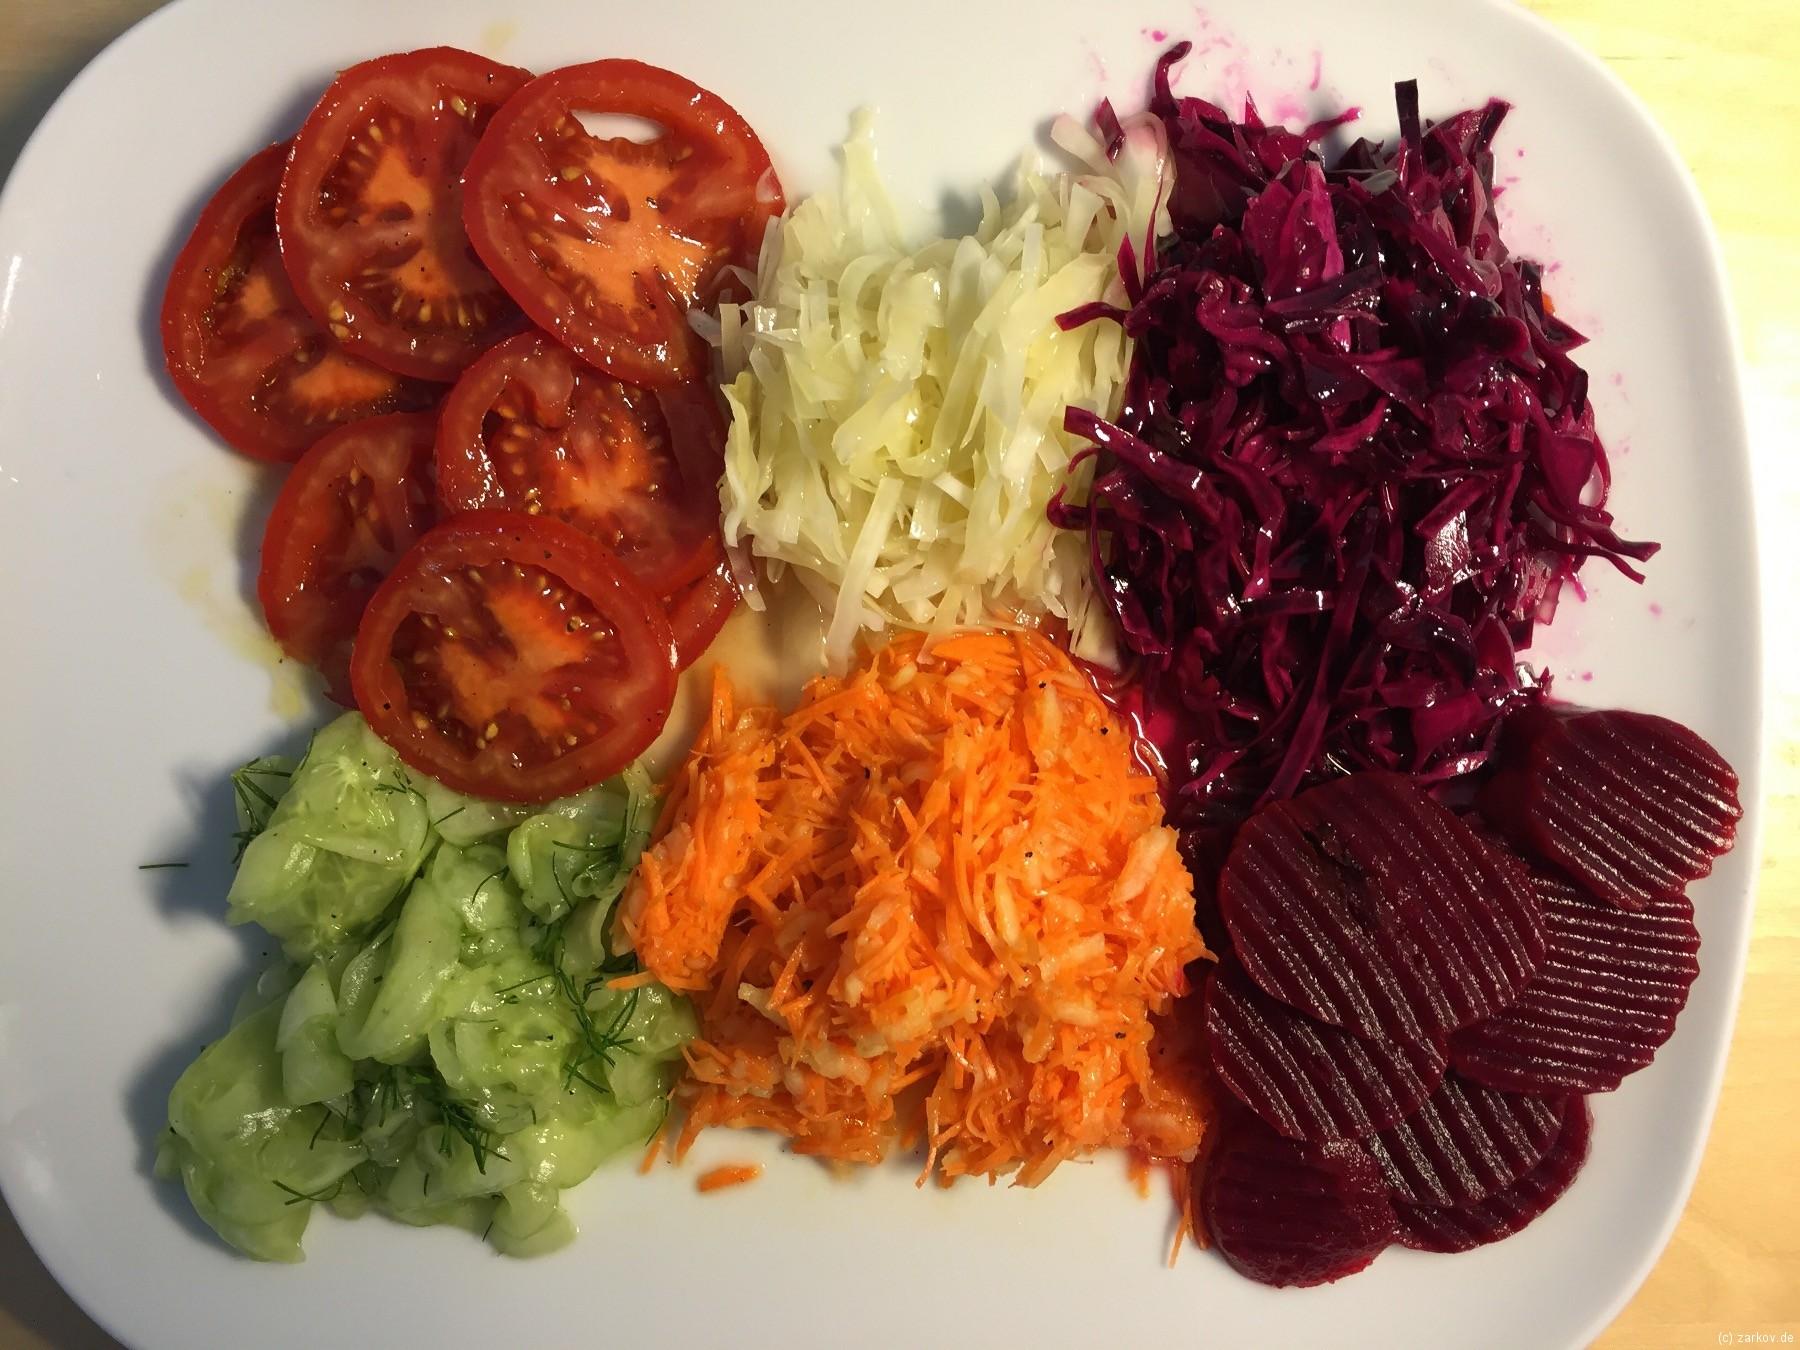 Salatteller Krautsalat Rotkrautsalat Möhrensalat Gurkensalat Tomatensalat